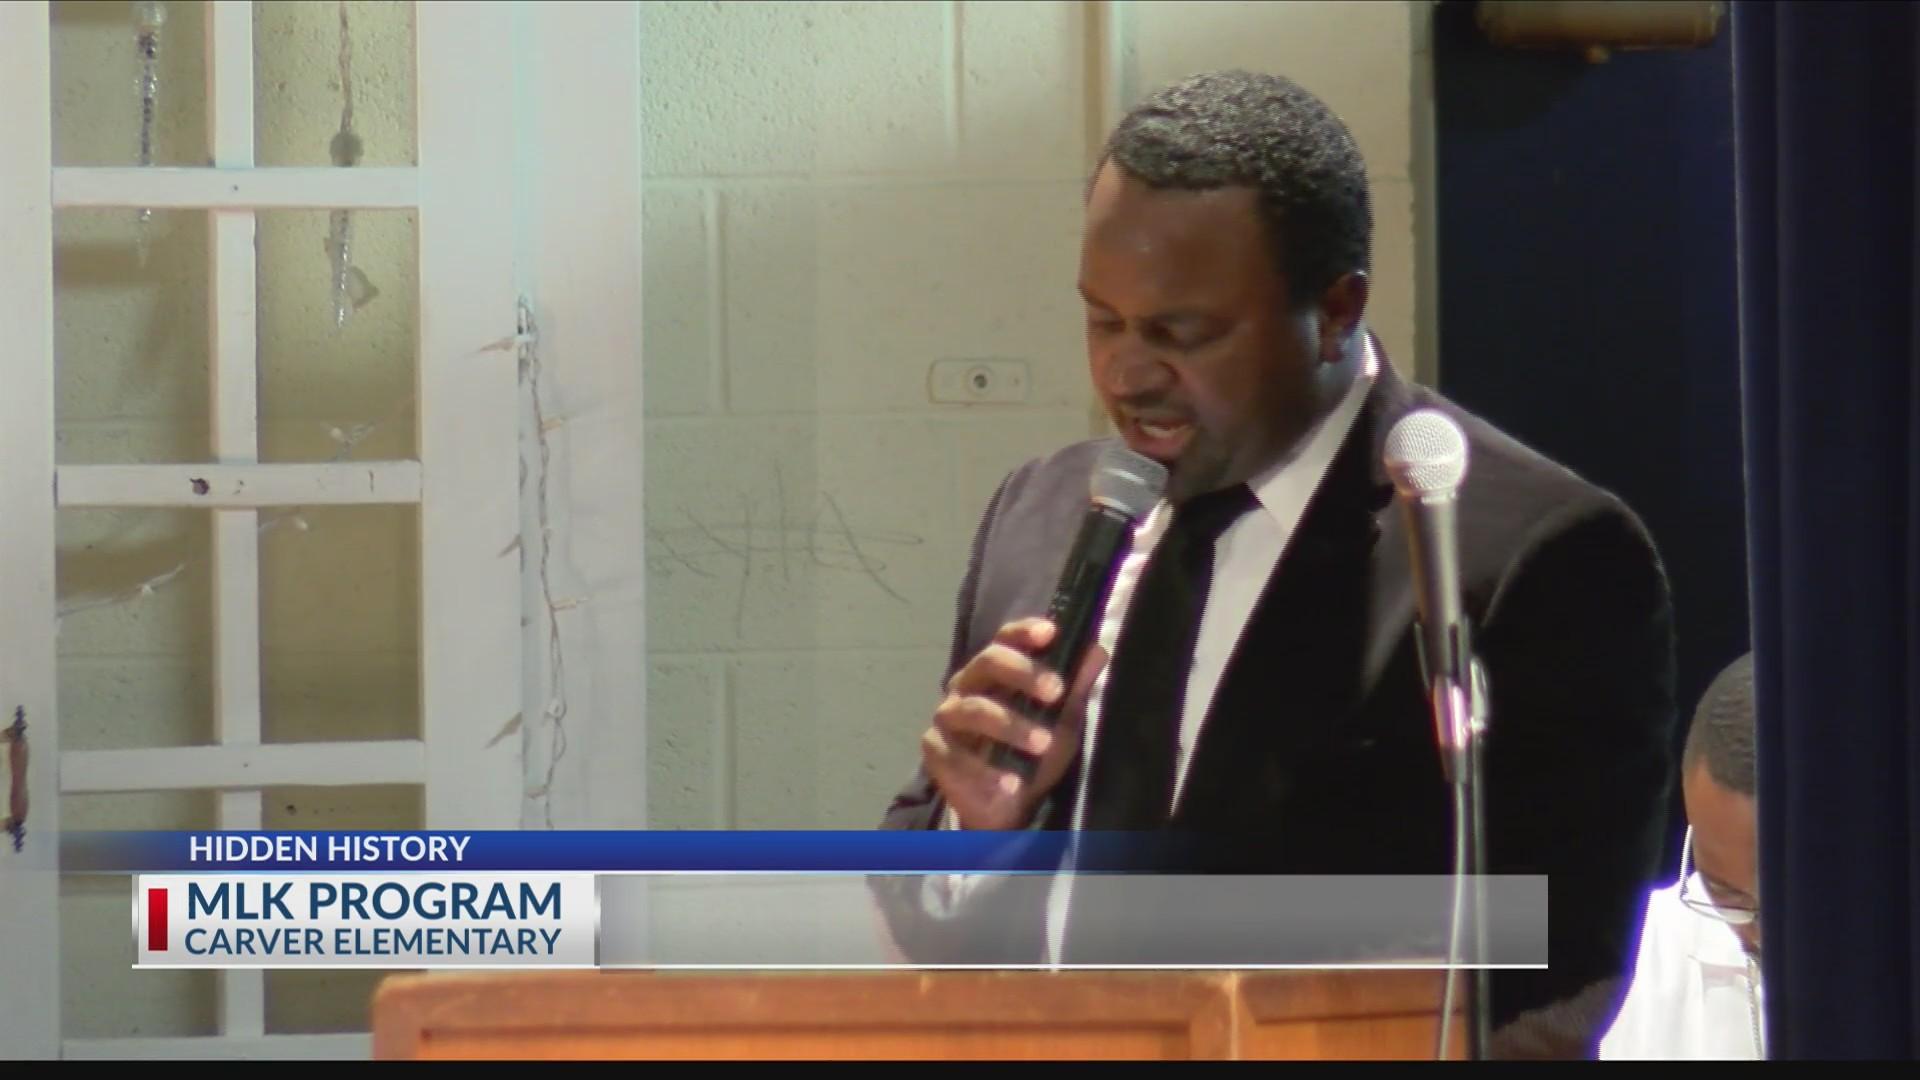 Amarillo International Ministerial Alliance Hosts MLK Program